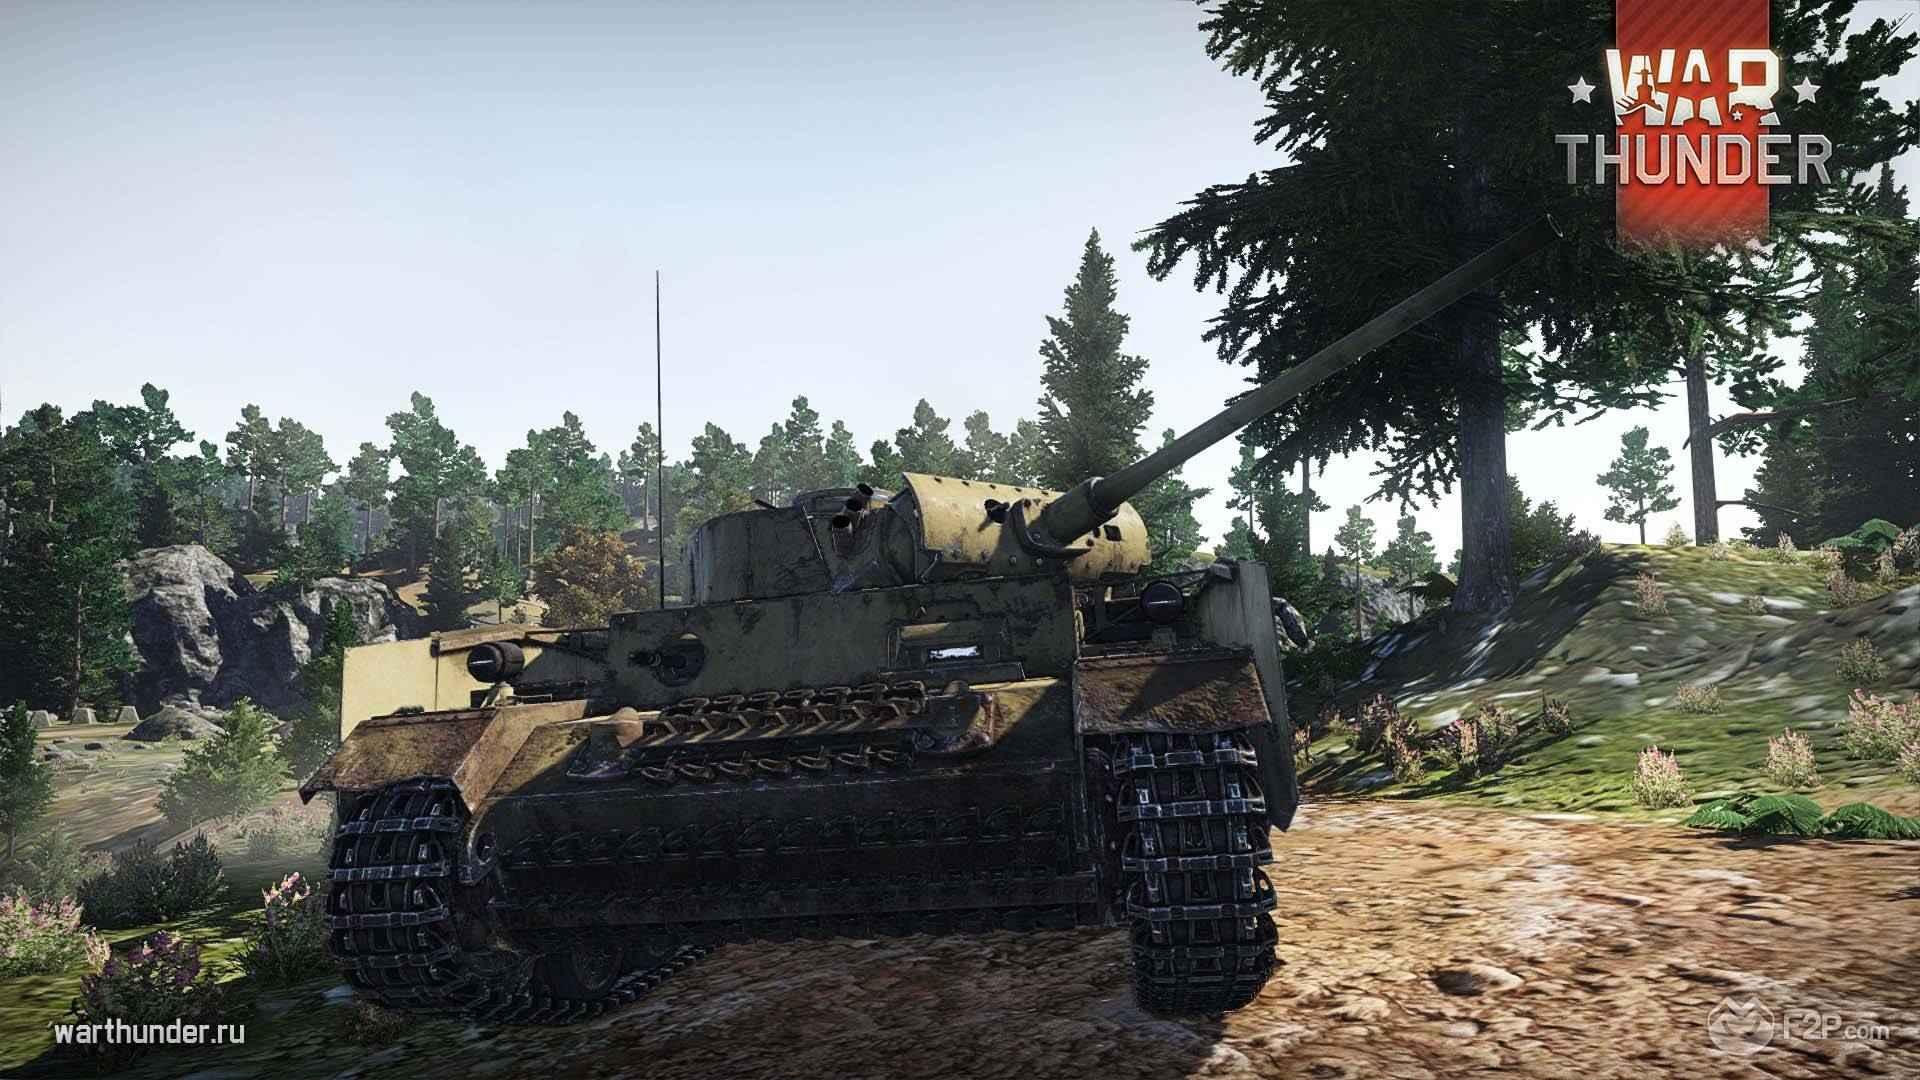 war thunder вызов артиллерии